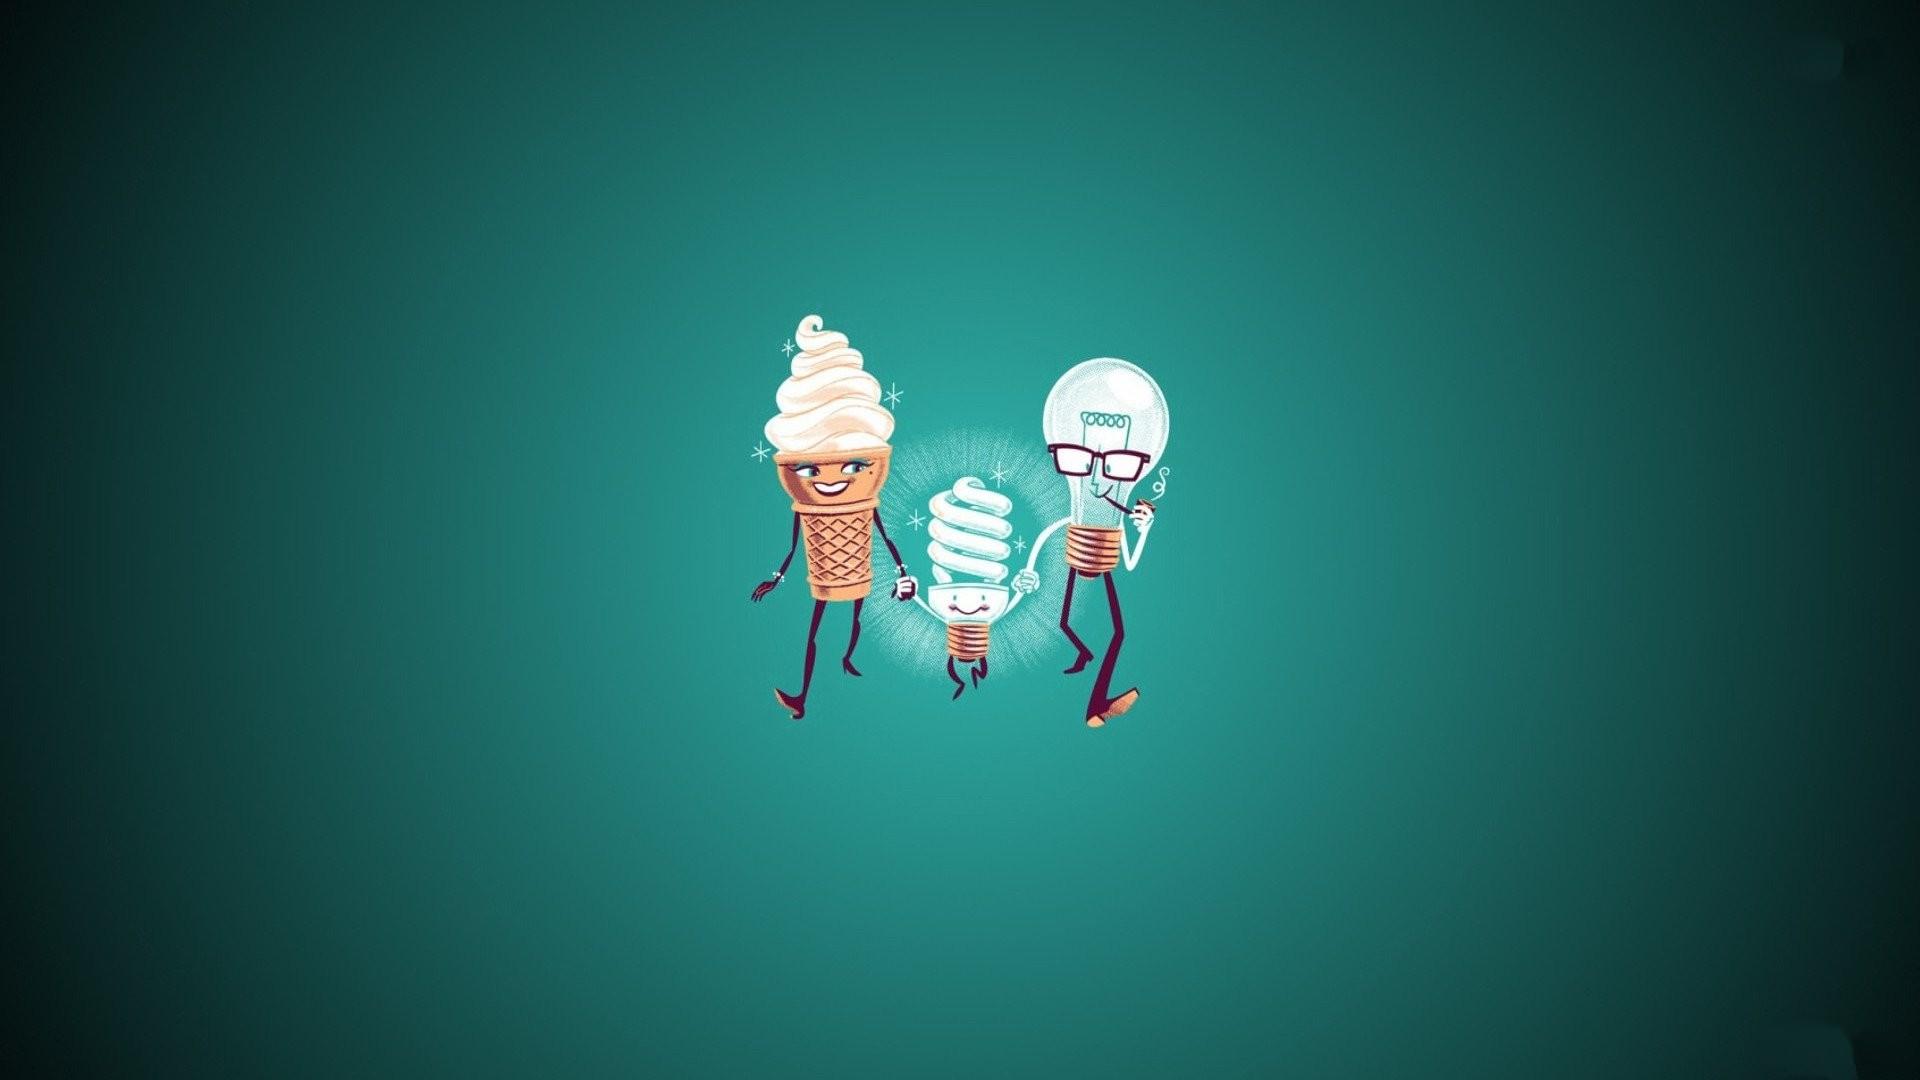 Hd Cute Ice Cream Photos Hd Desktop Wallpapers Smart - Illustration - HD Wallpaper